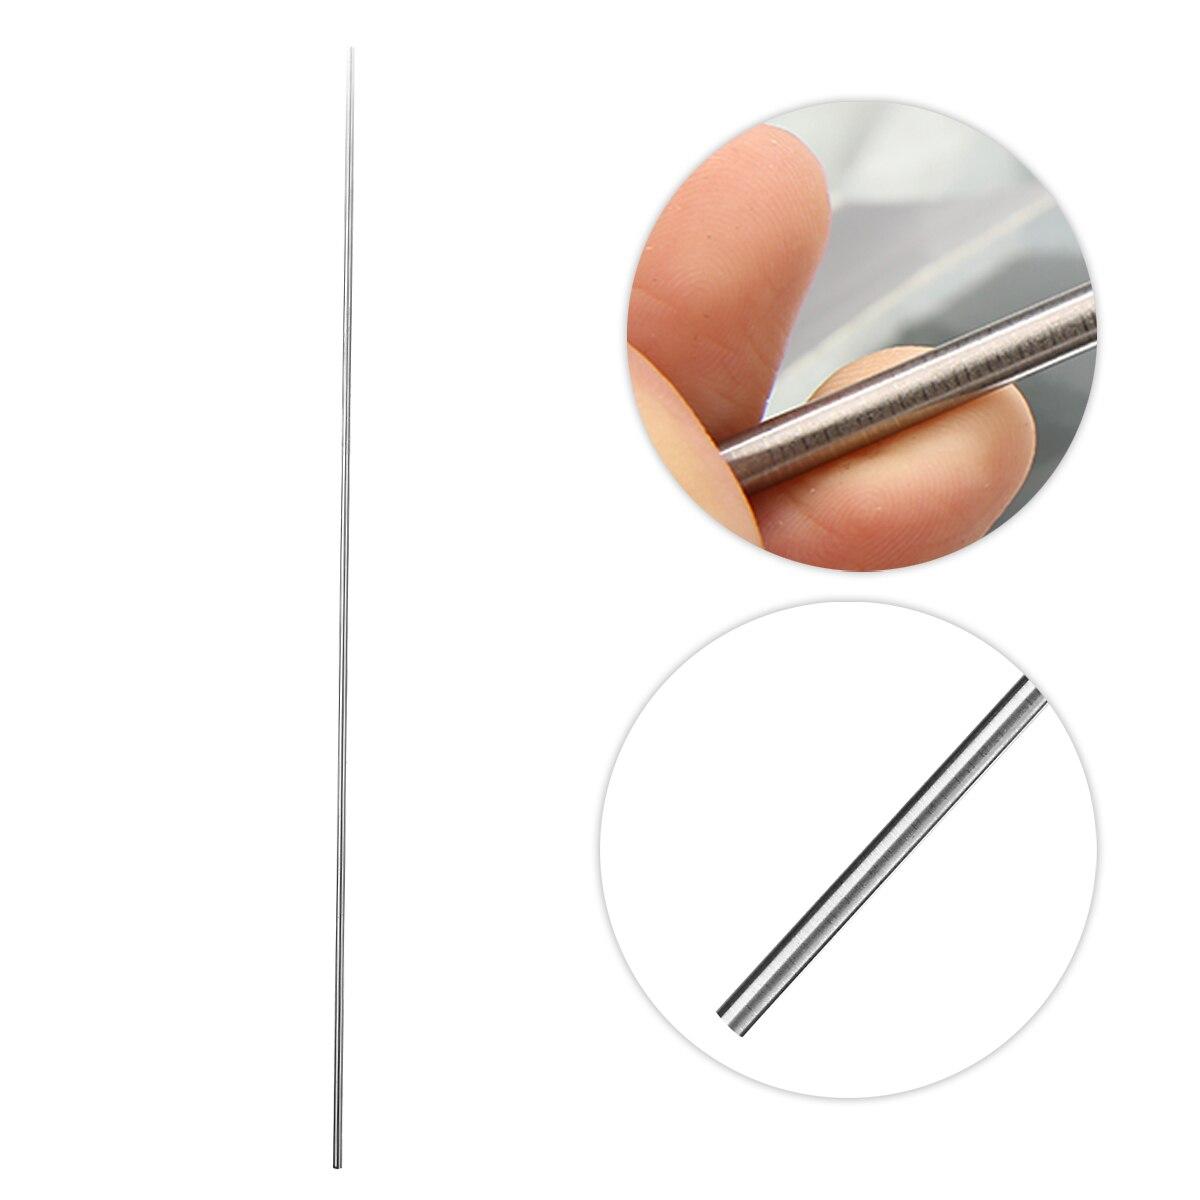 1Pcs Grade 5 GR5 Titanium Rod Ti Bar Metal Rod Stick Welding Tool 50cmx4mm With Corrosion Resistance